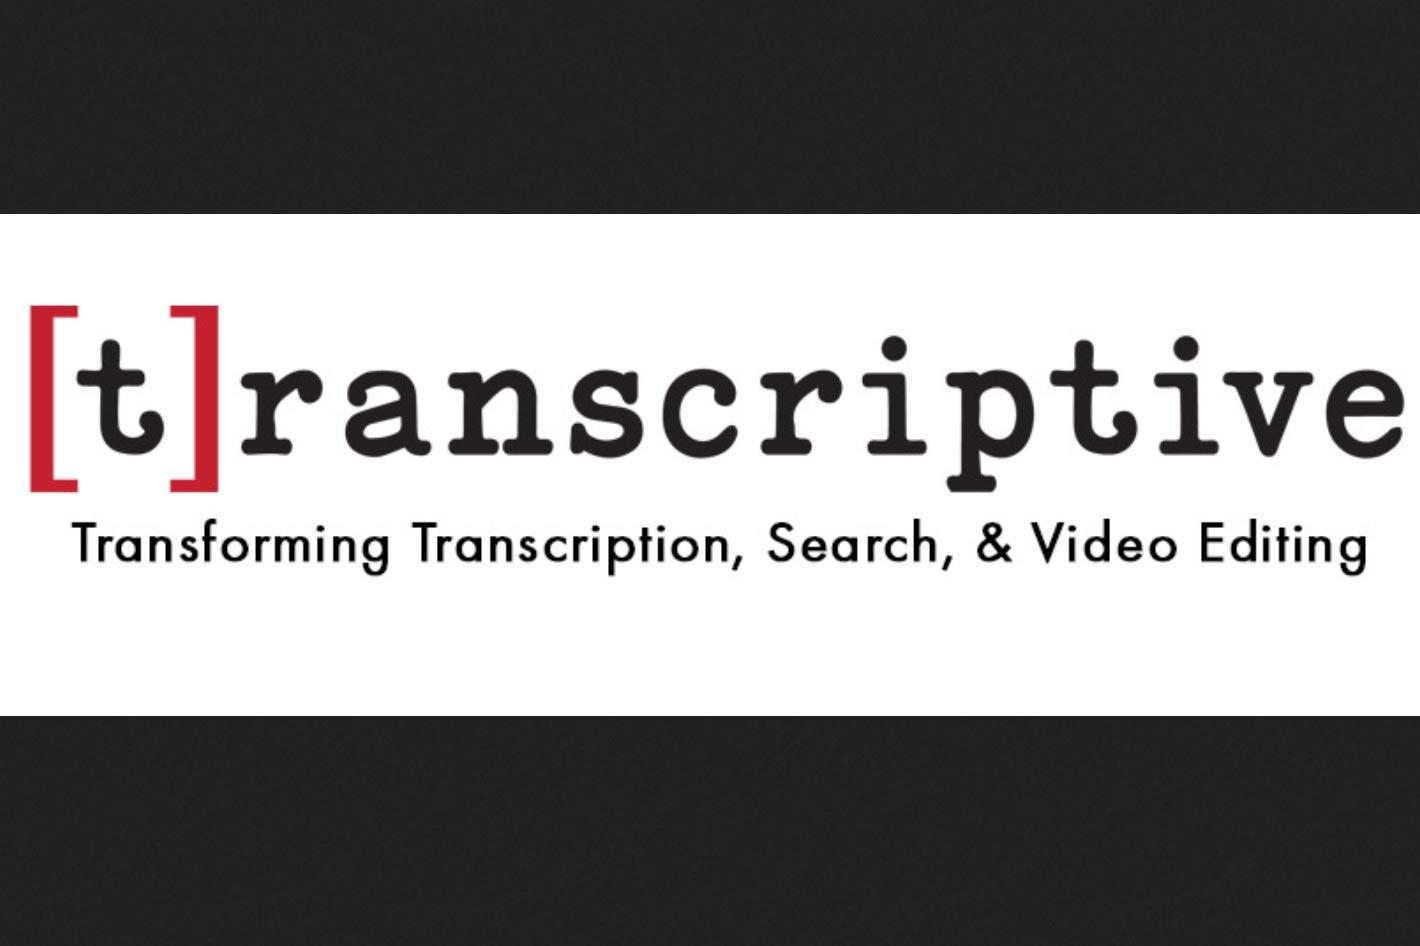 Digital Anarchy continues to improve Transcriptive